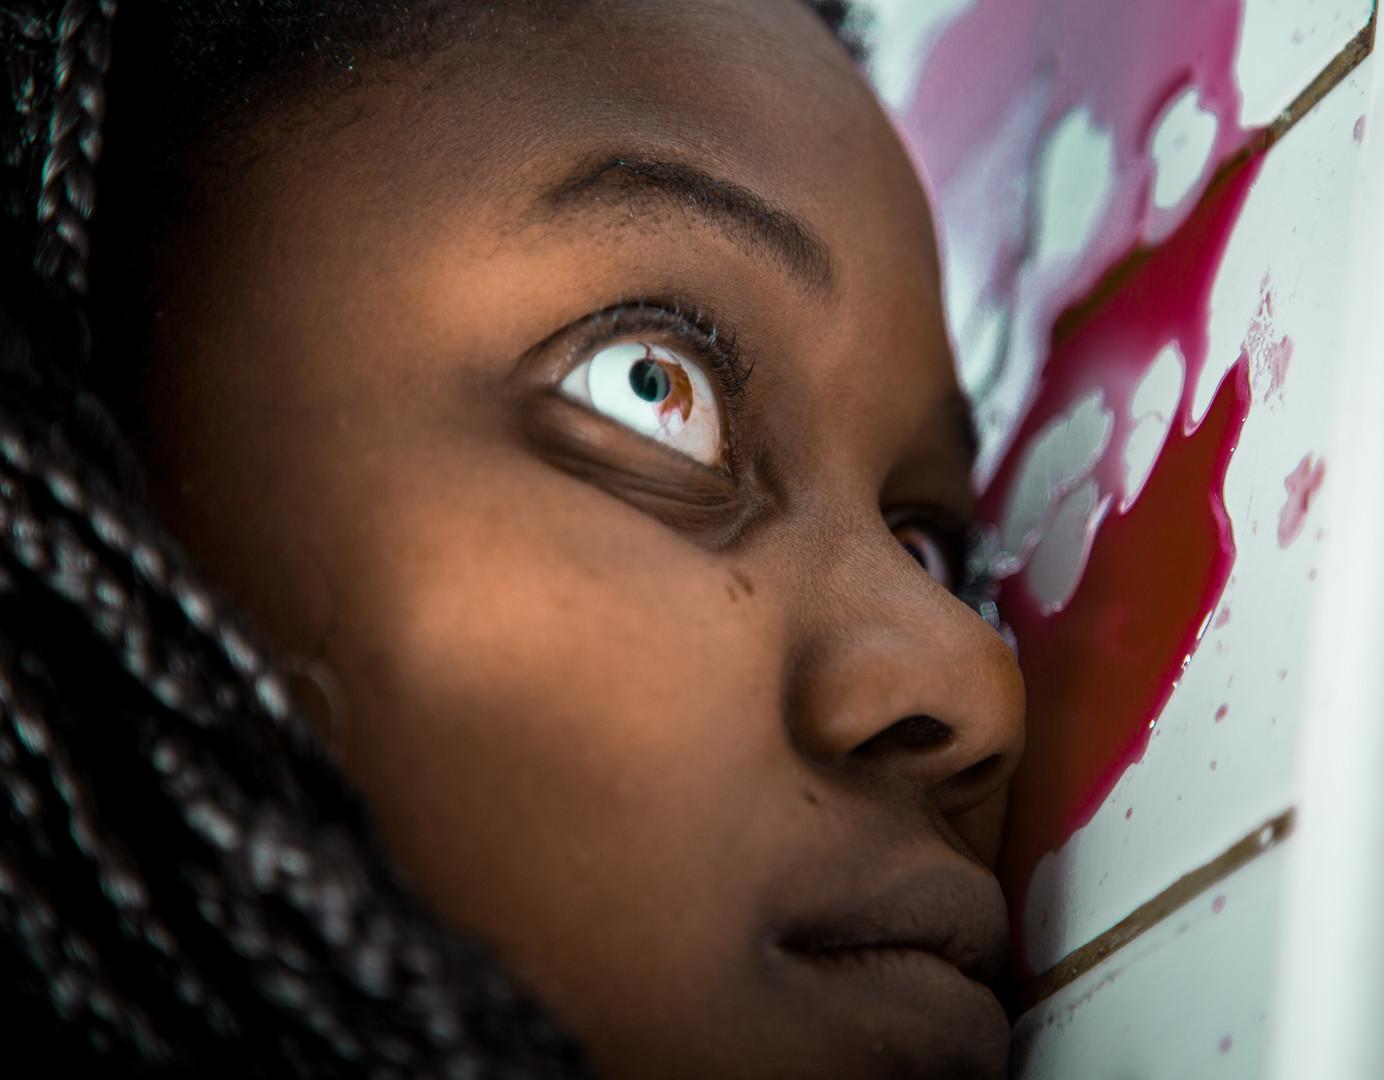 Final Girls Berlin Film Festival Review: SOCIAL HORROR Block